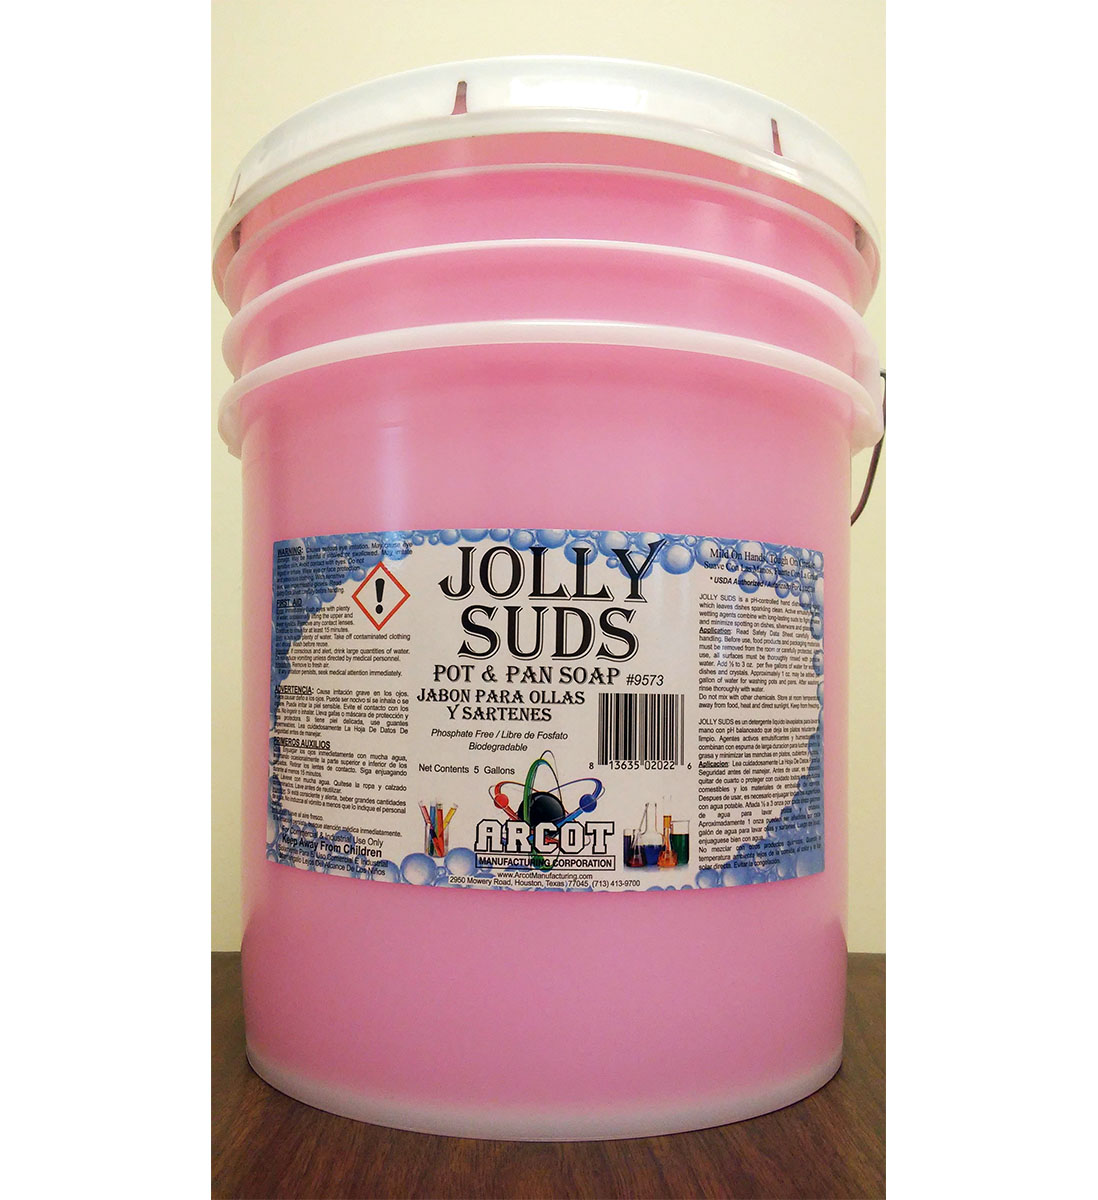 Jolly Suds